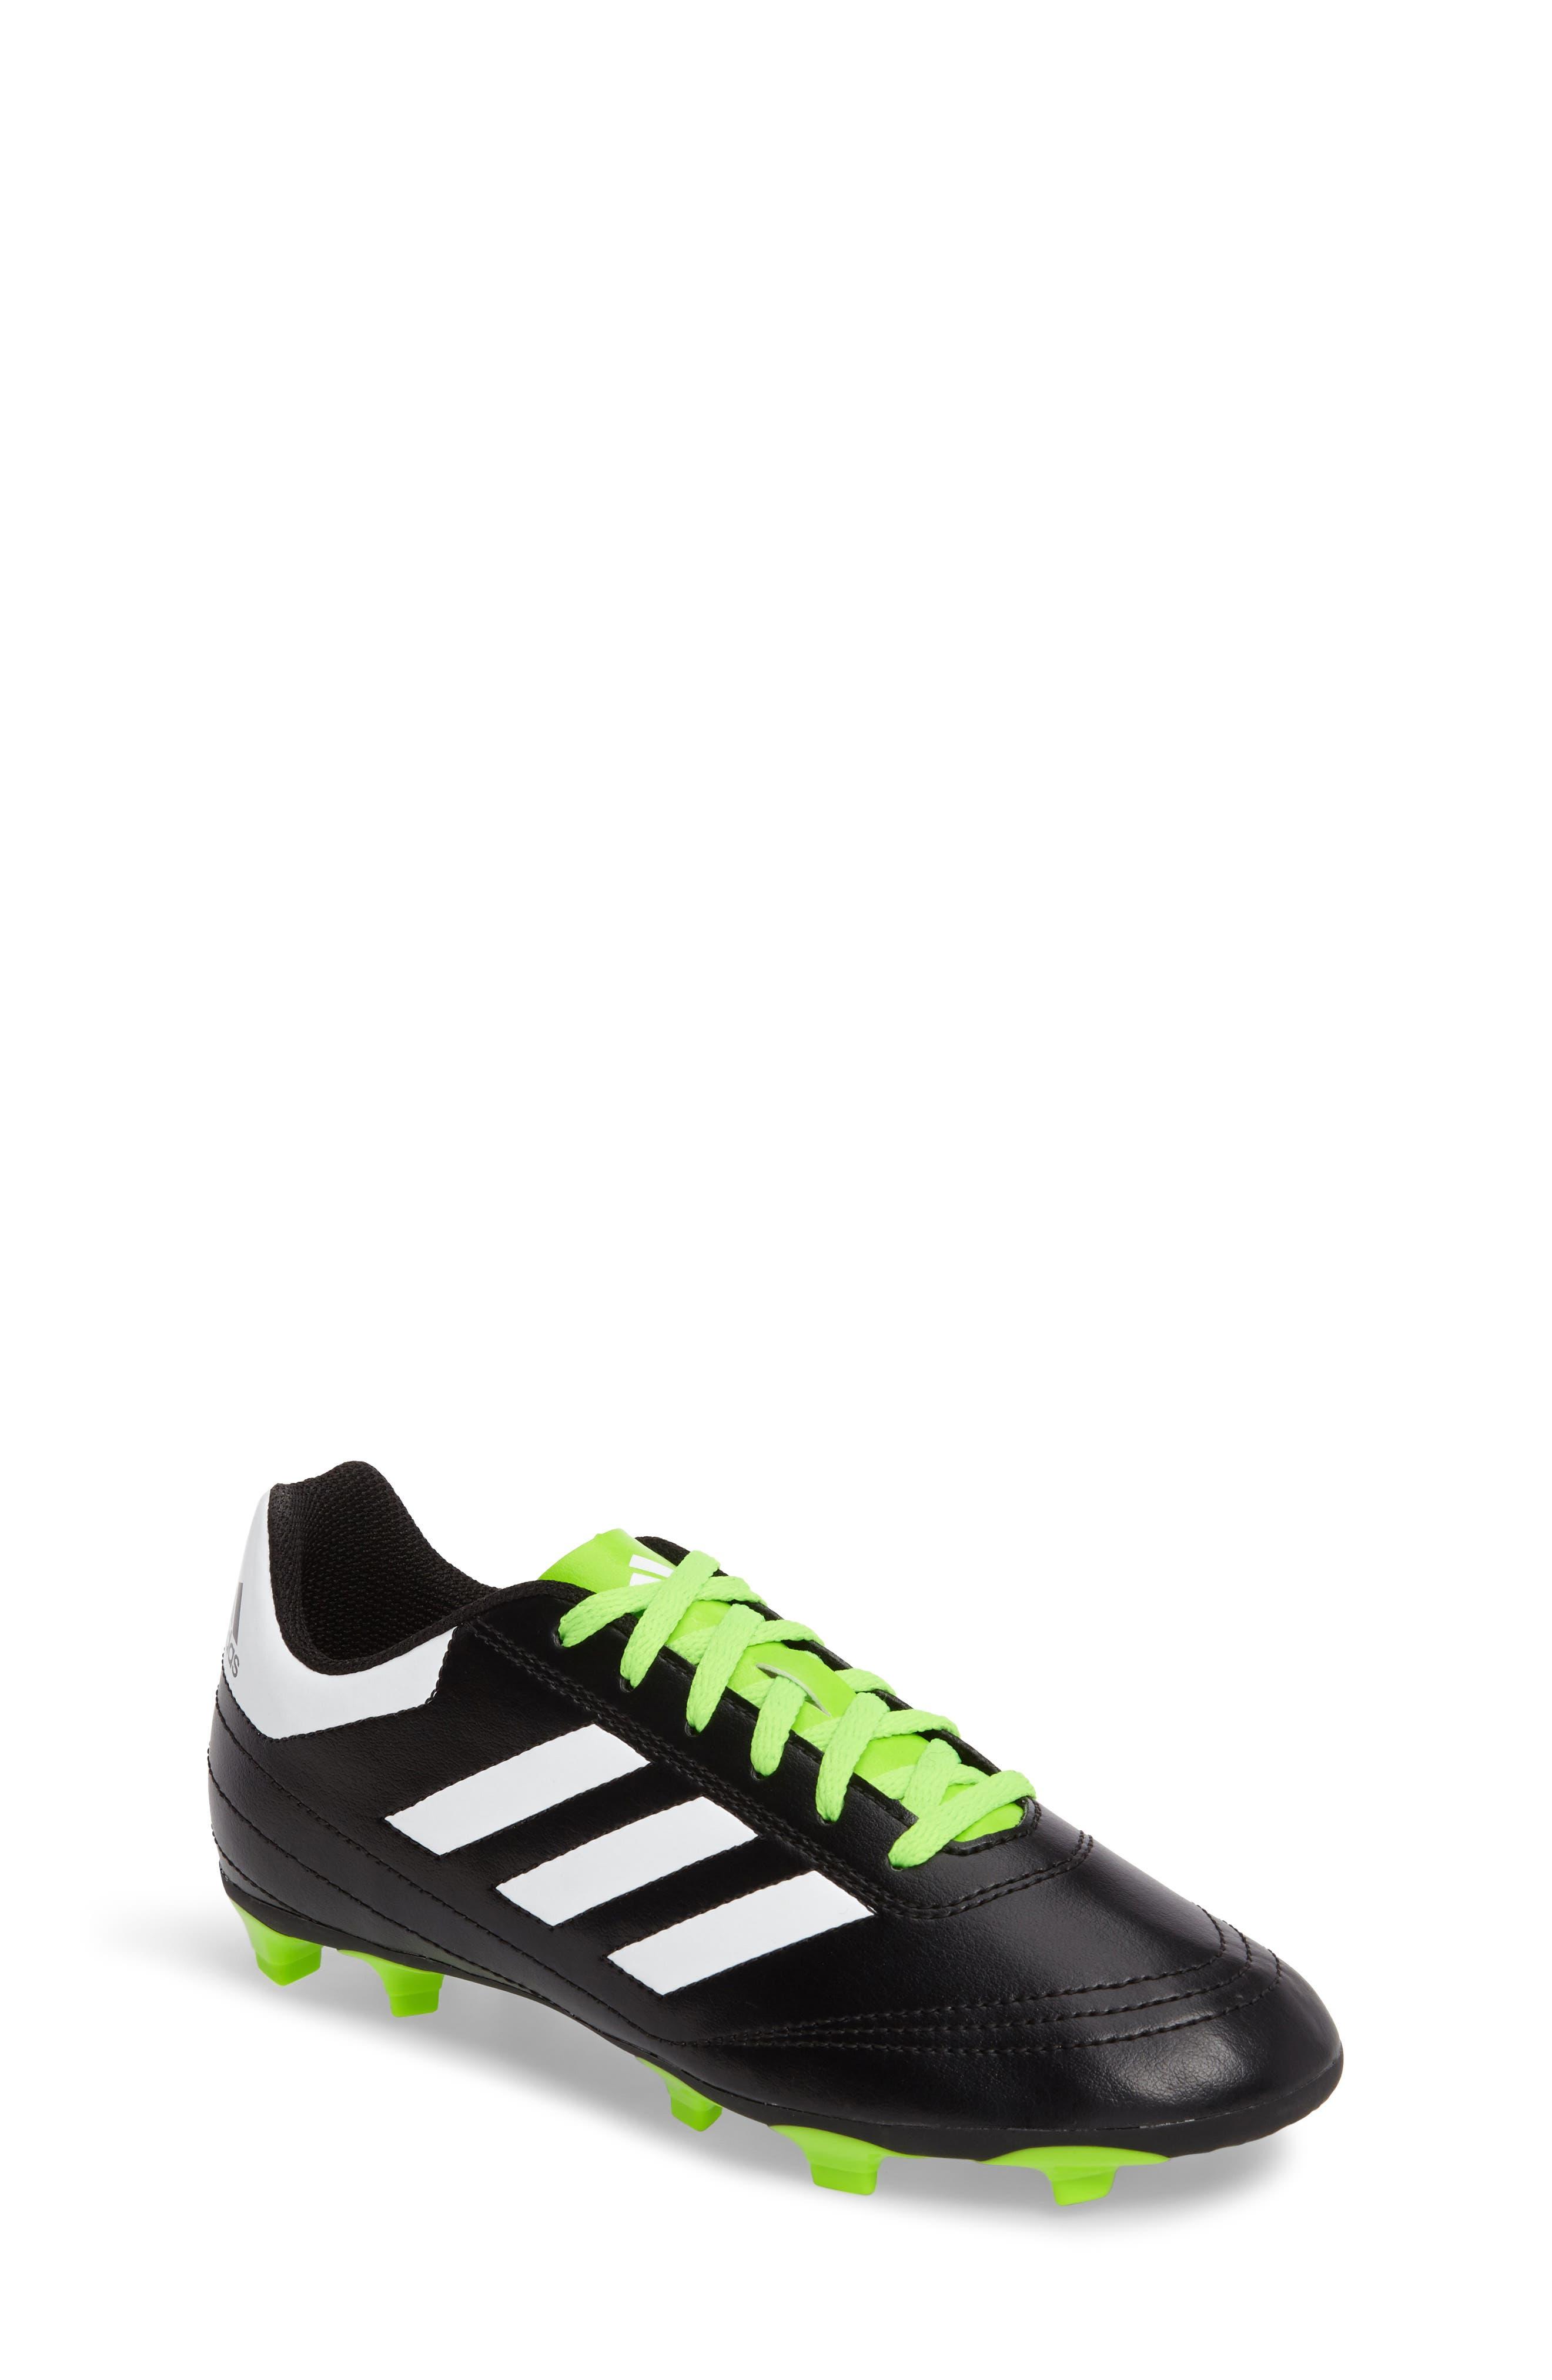 Alternate Image 1 Selected - adidas Goletto VI Soccer Shoe (Toddler, Little Kid & Big Kid)